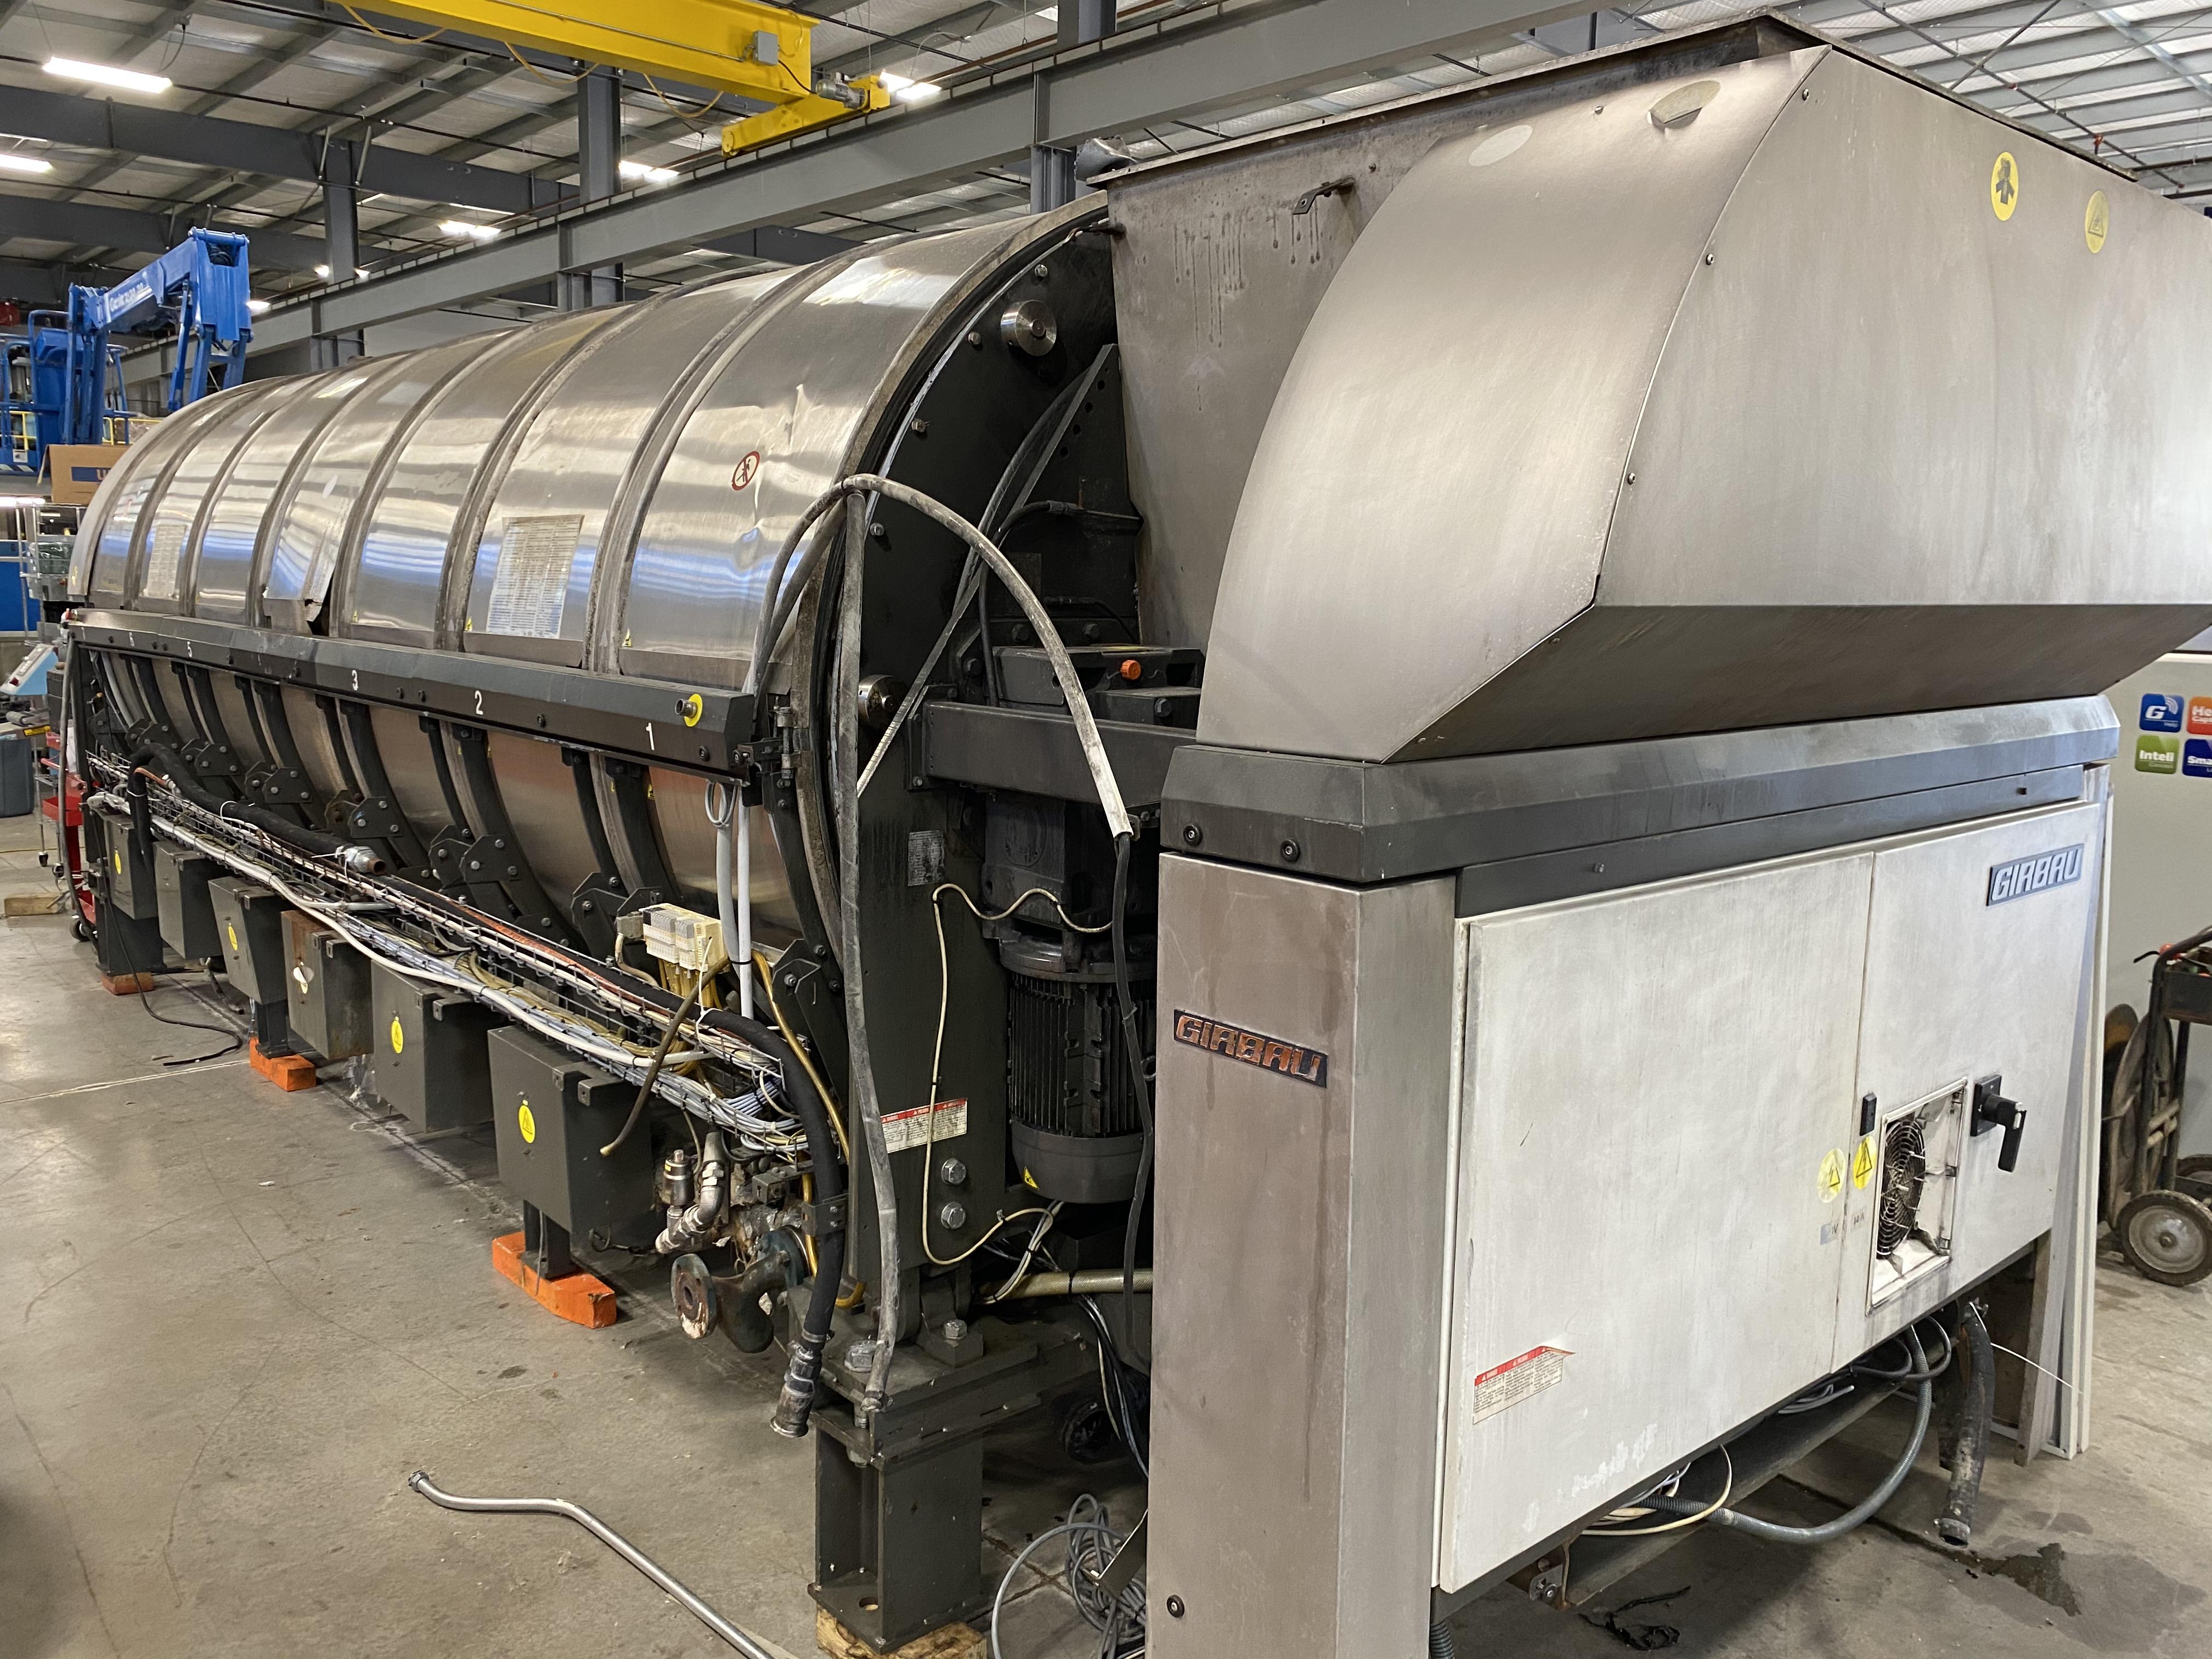 Continental Girbau 7-mod tunnel washer